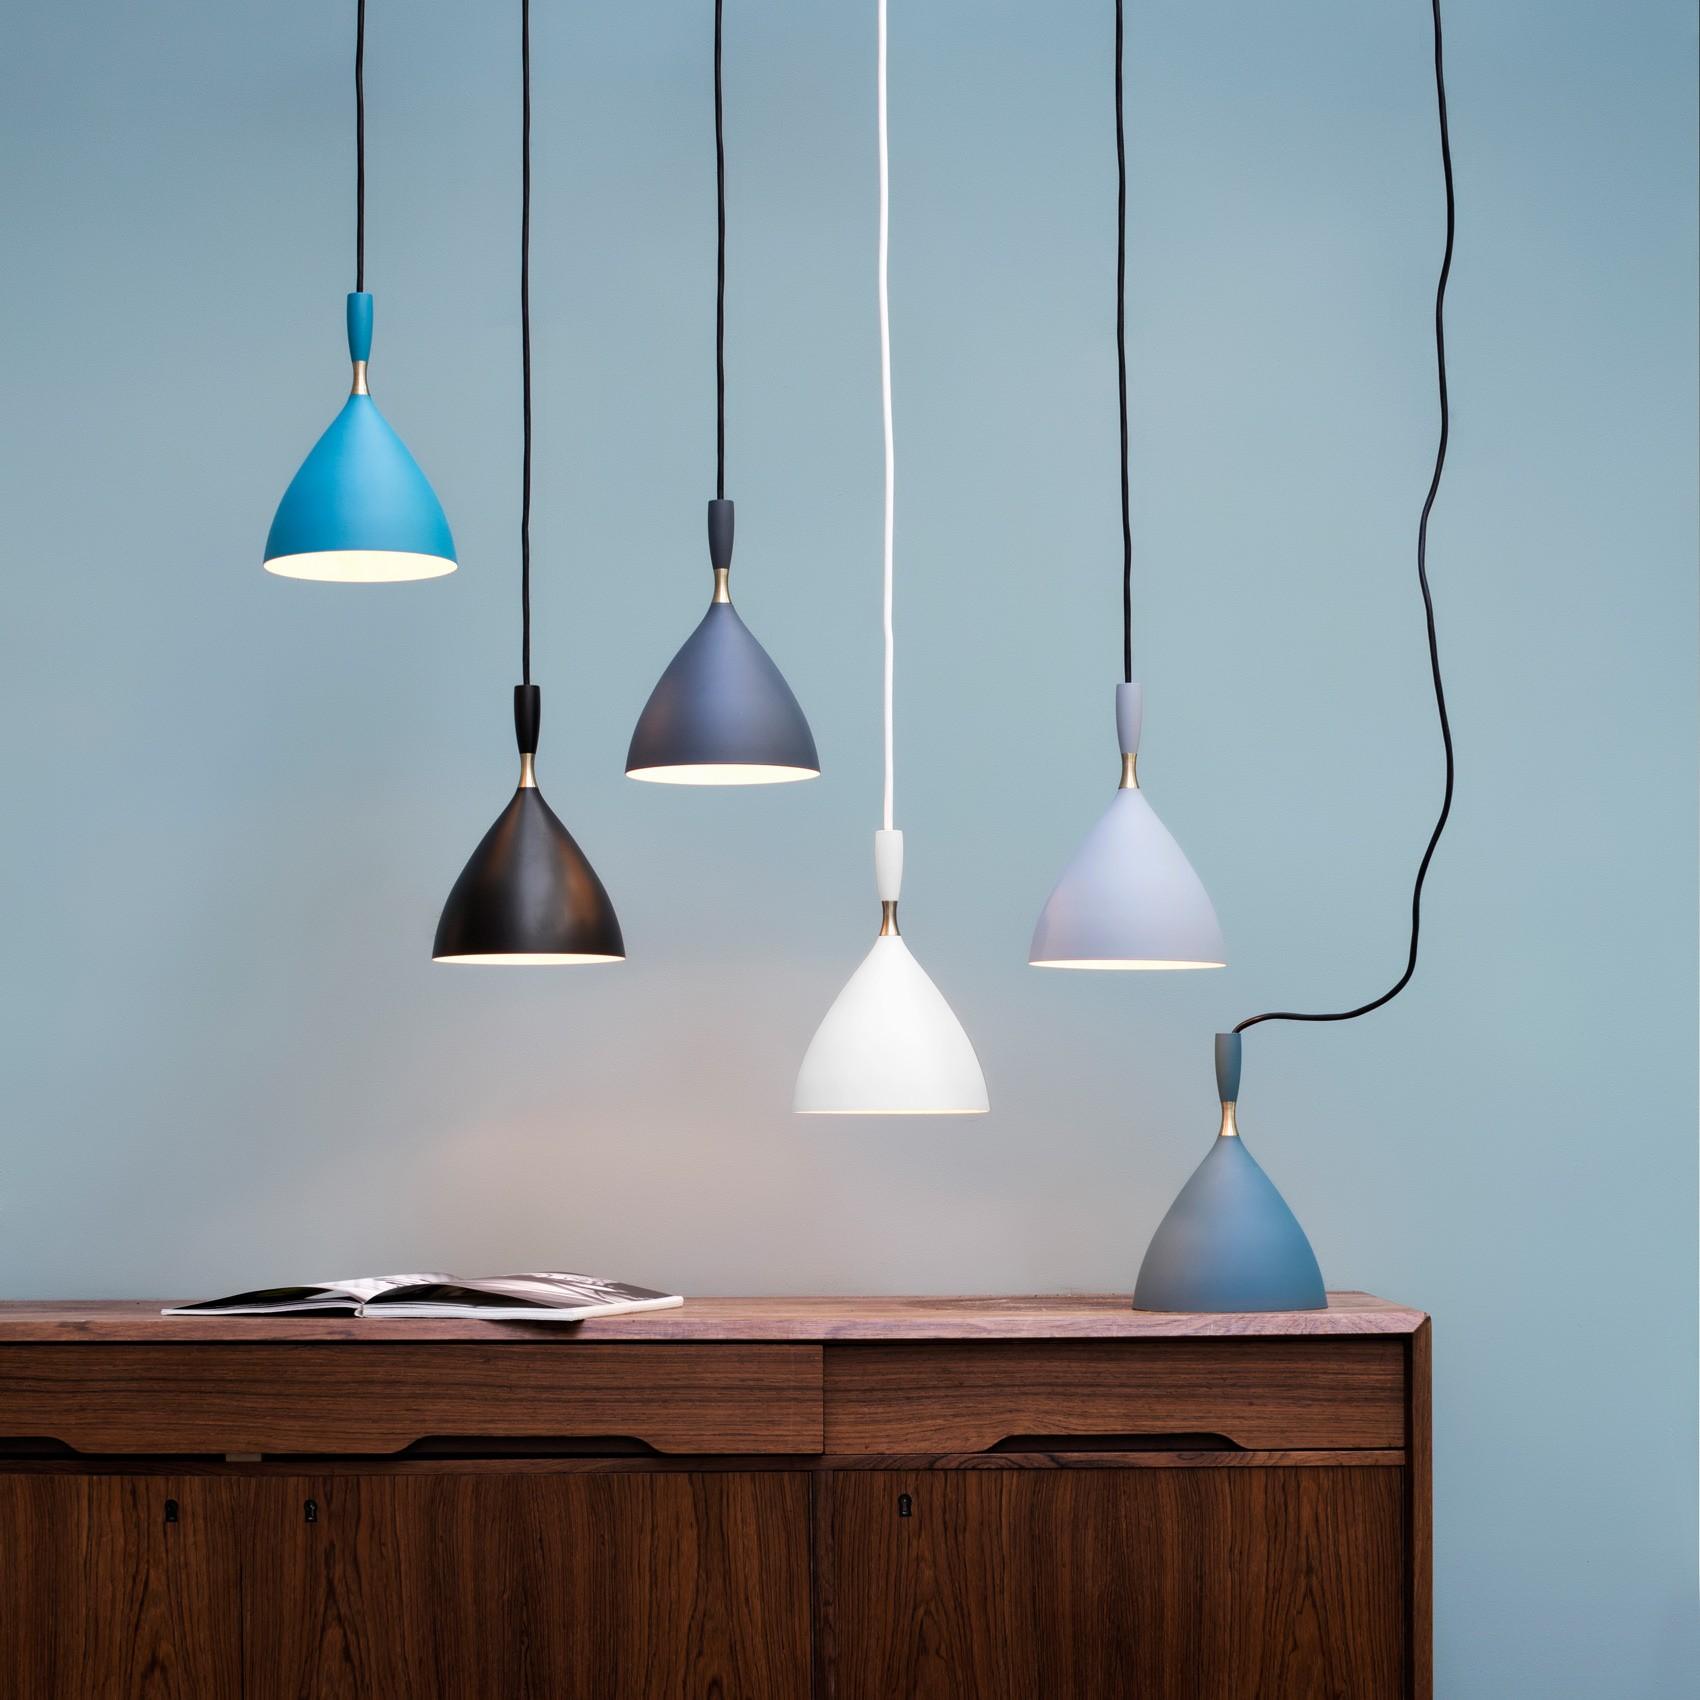 new-wave-nordica-northern-lighting-dokka-pendant-lights